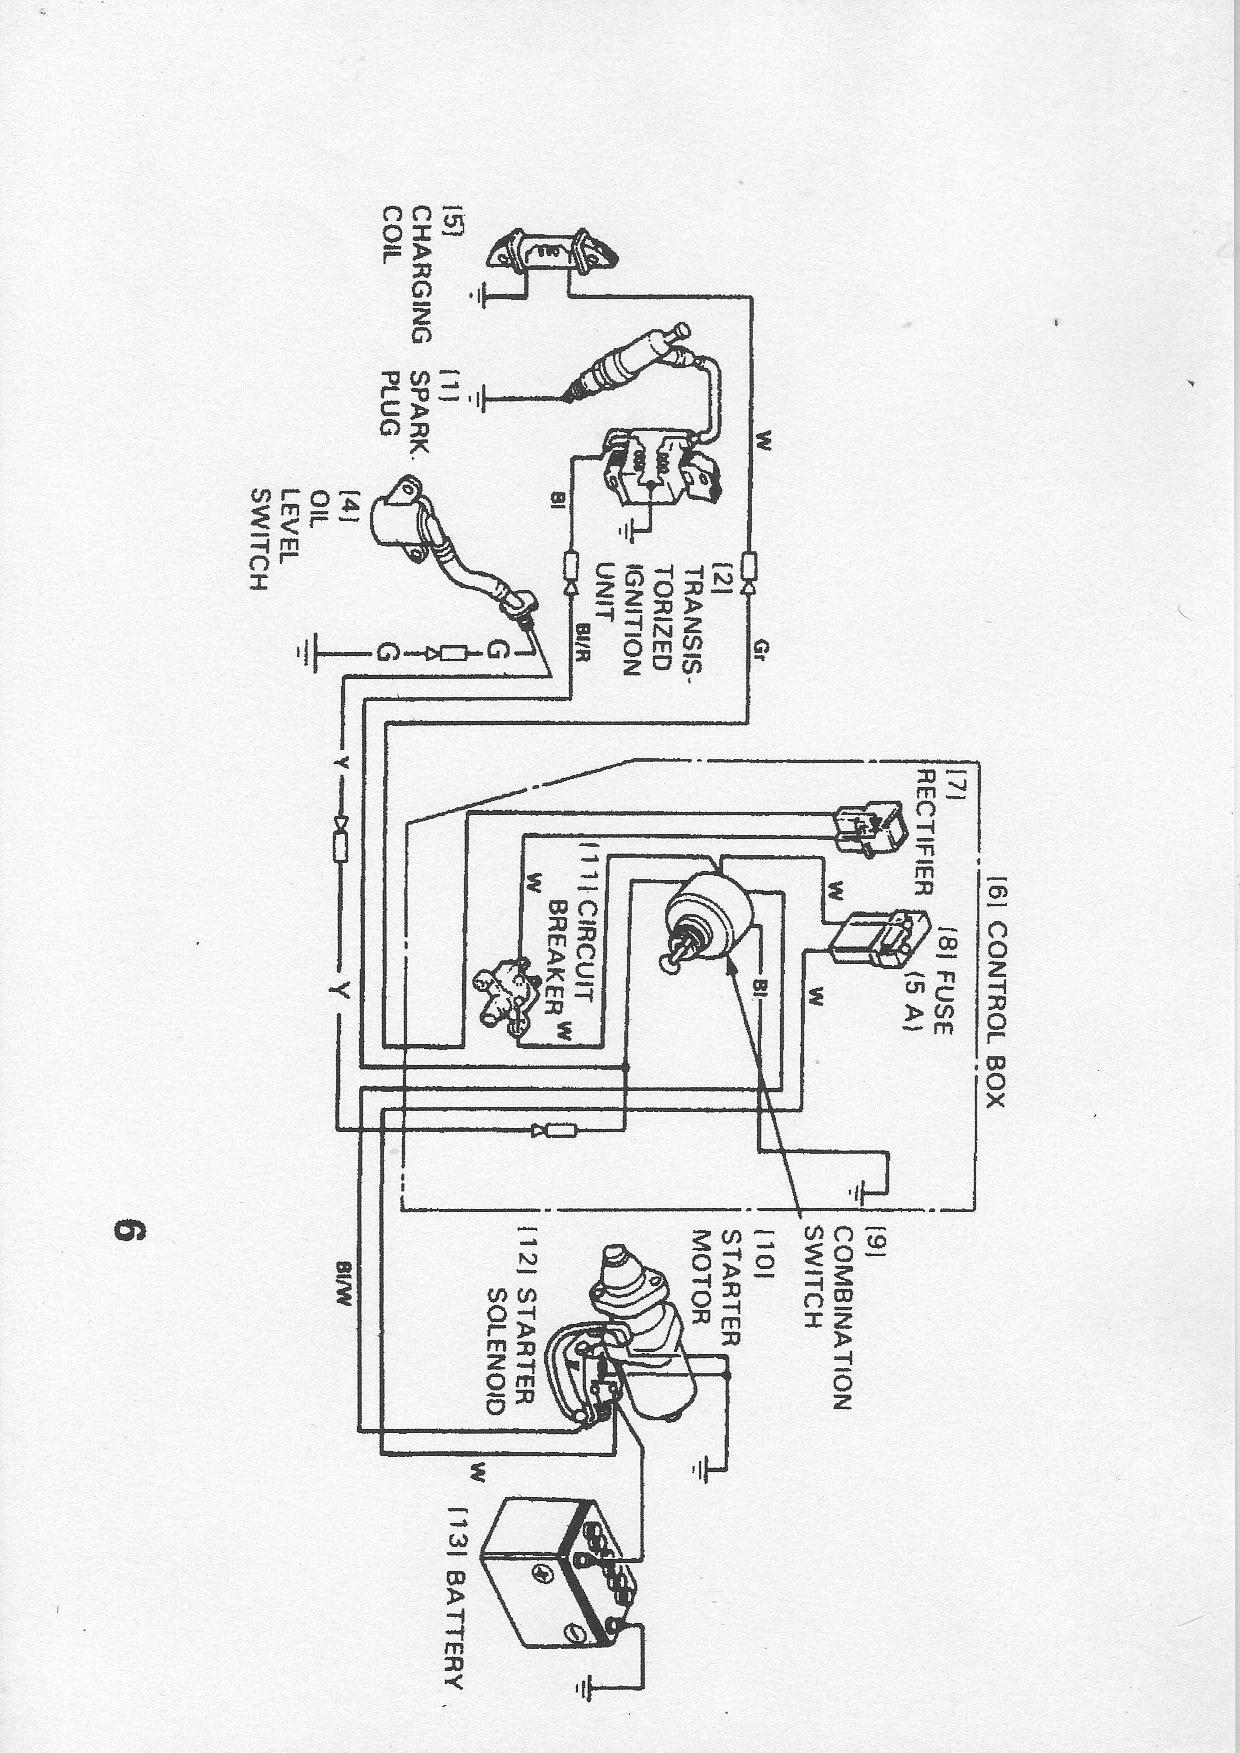 Wiring Diagram For Honda Gx390